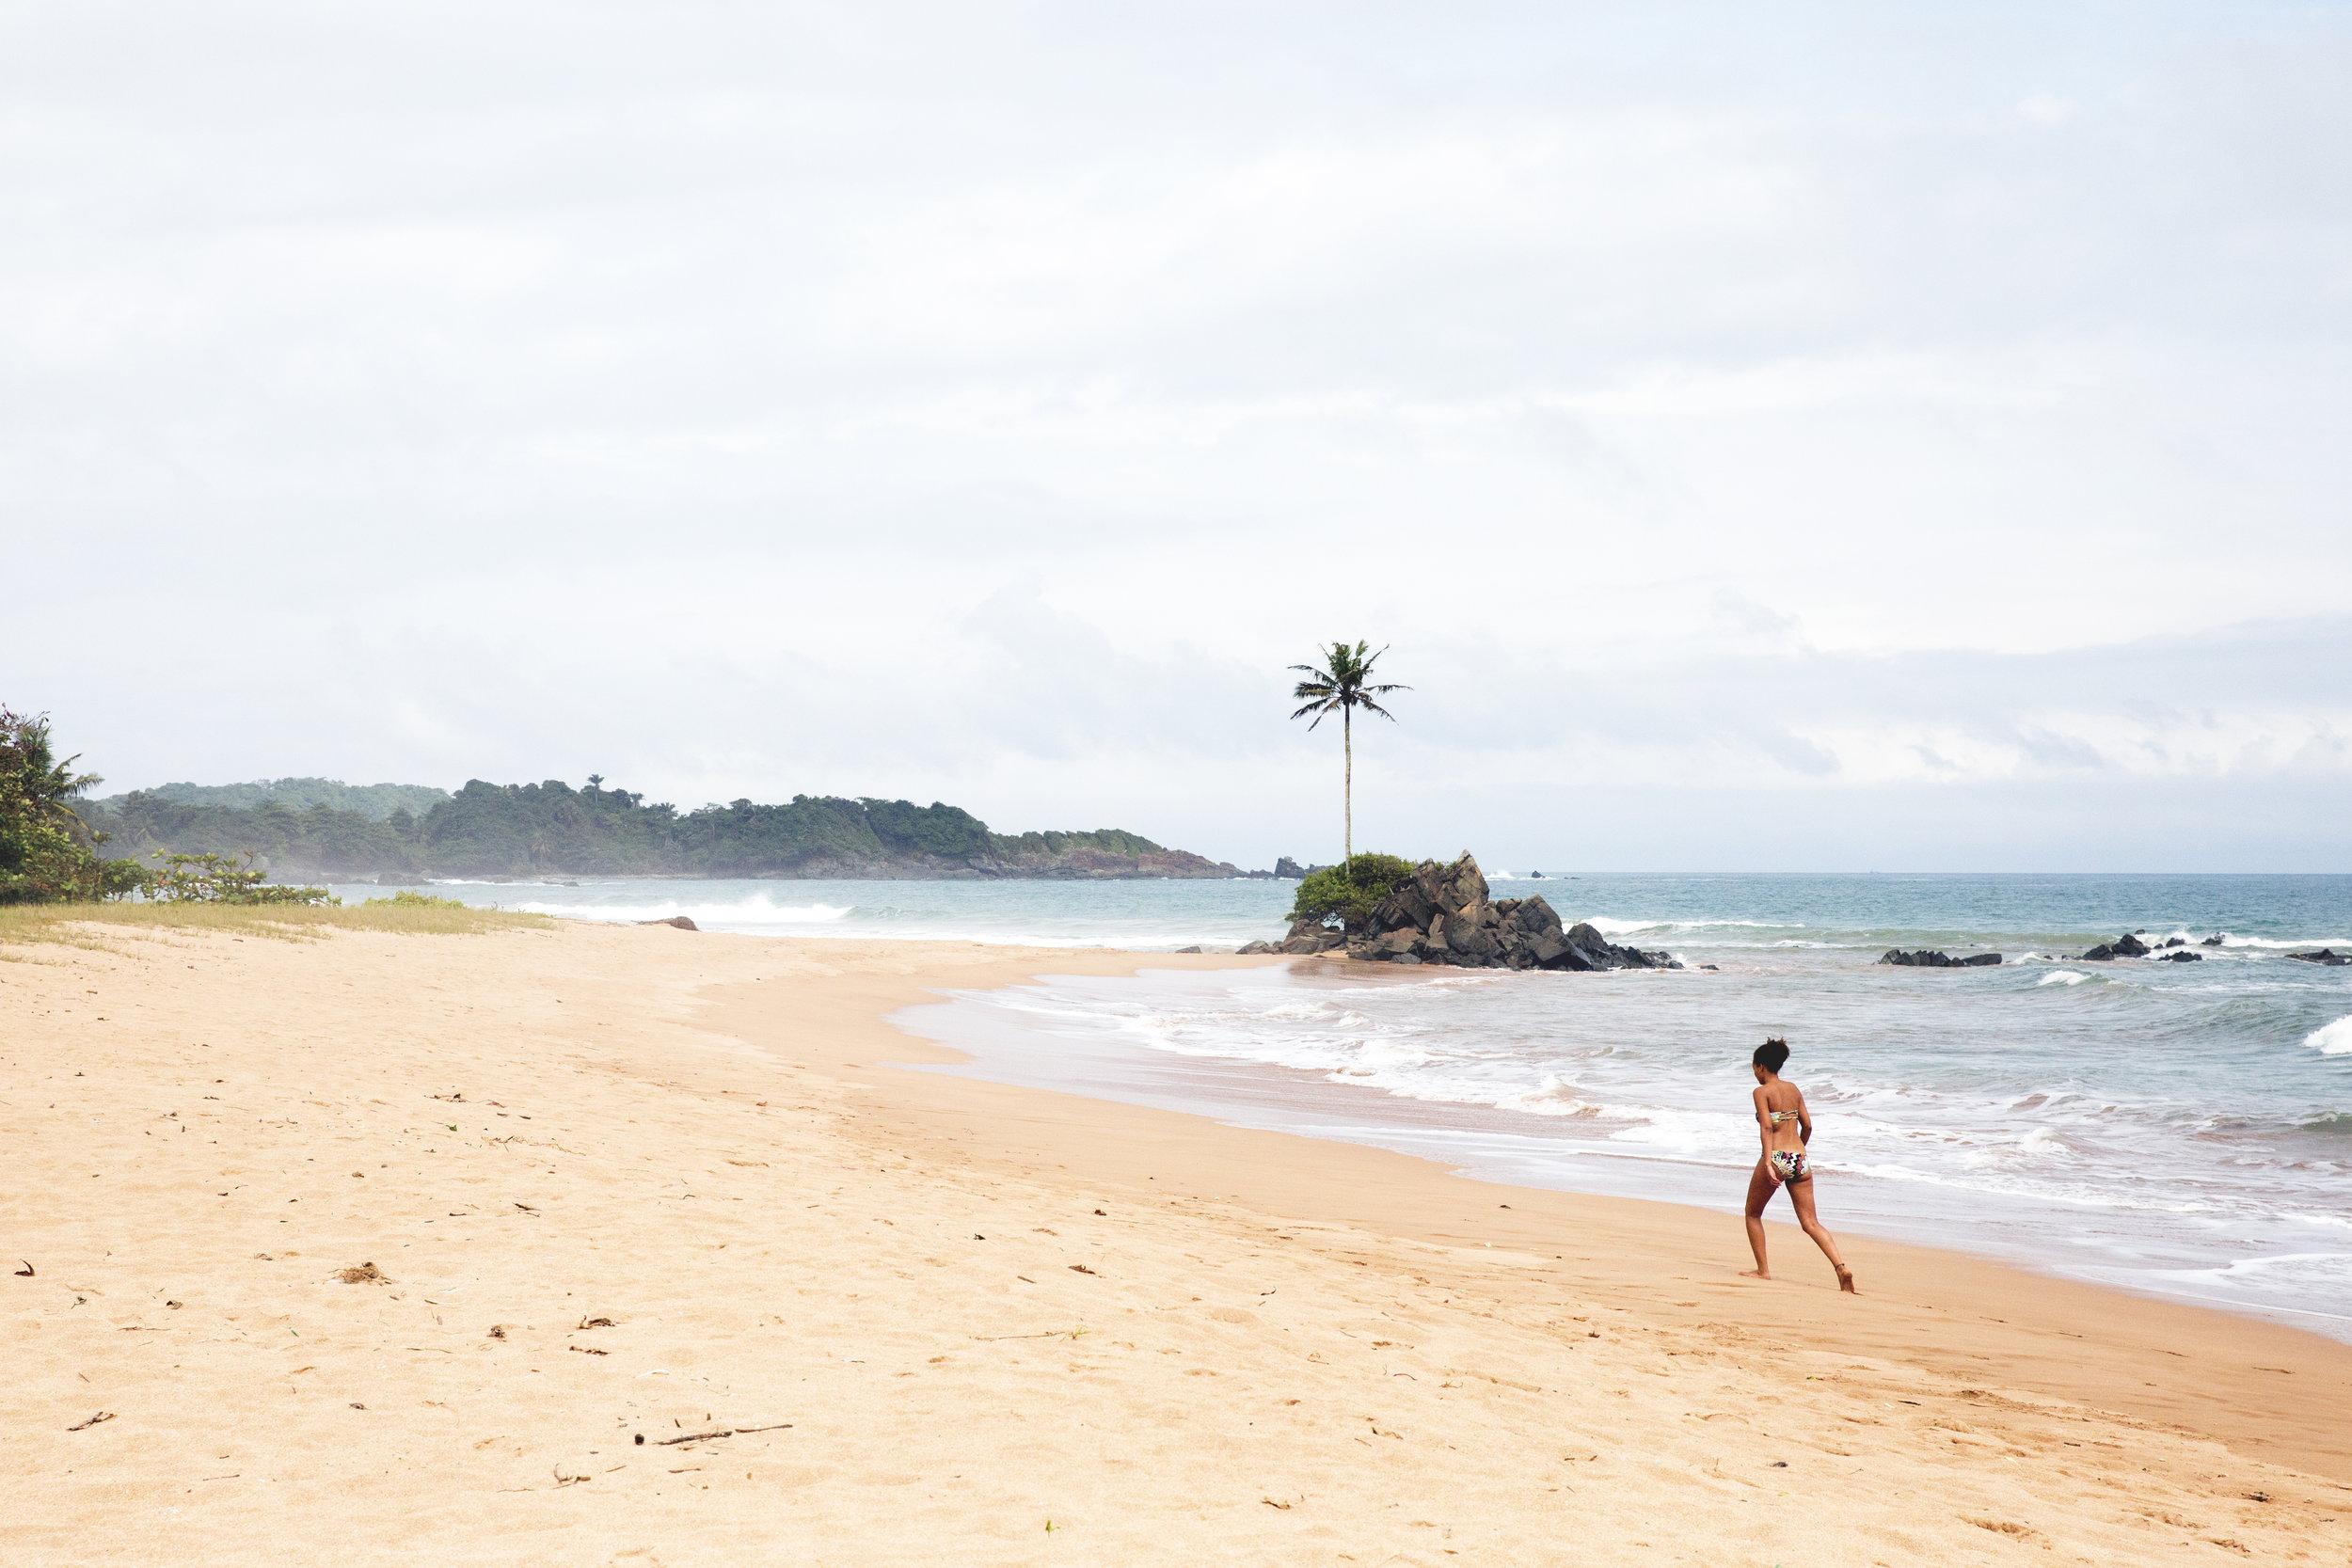 Theresa walks along the shore